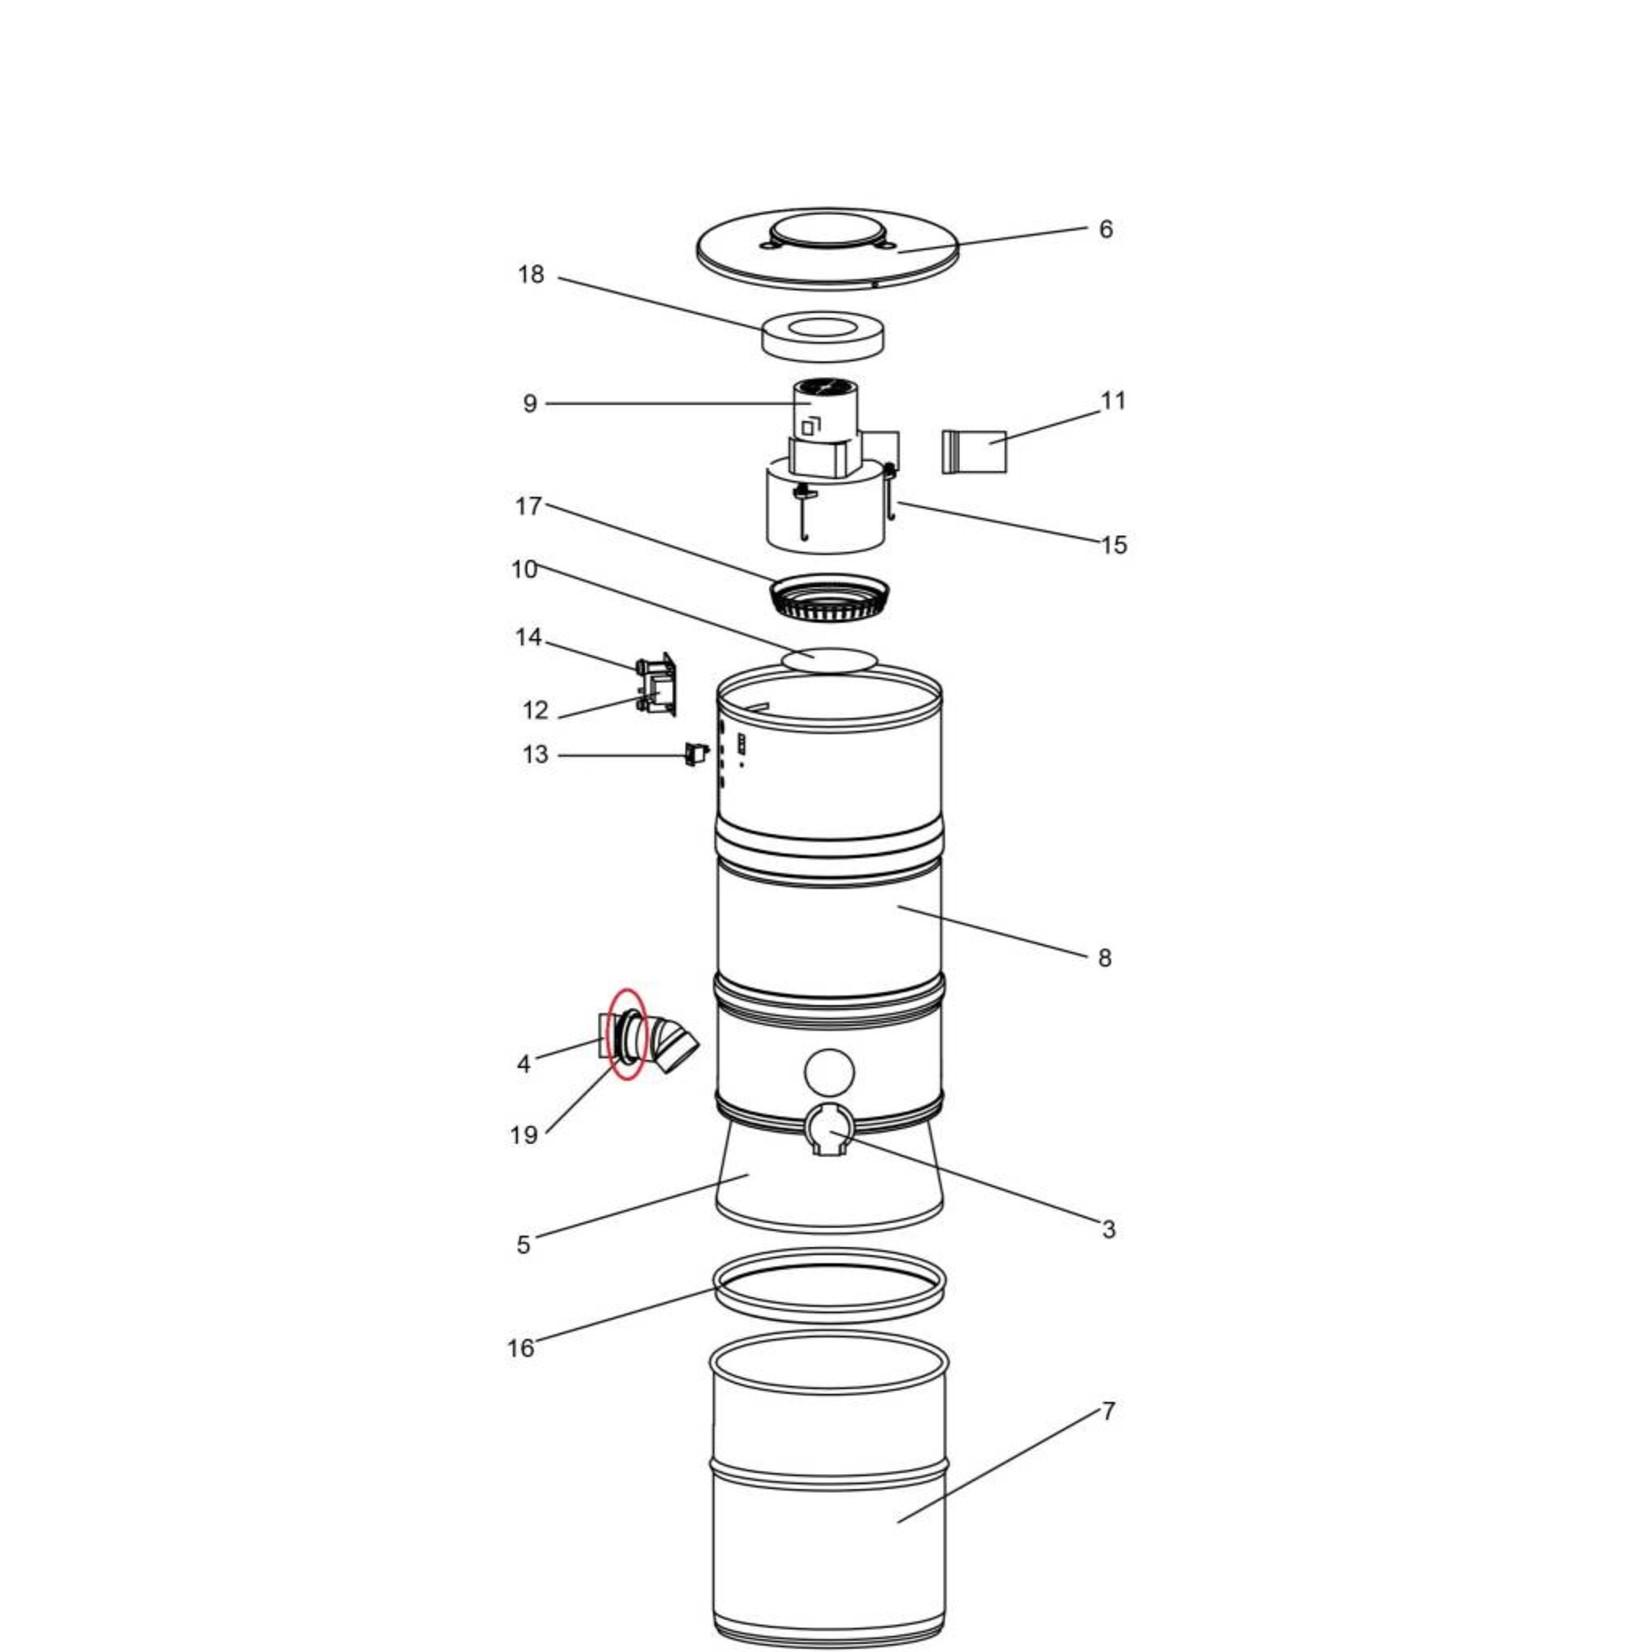 BEAM Beam Power Unit Utility Inlet Grommet